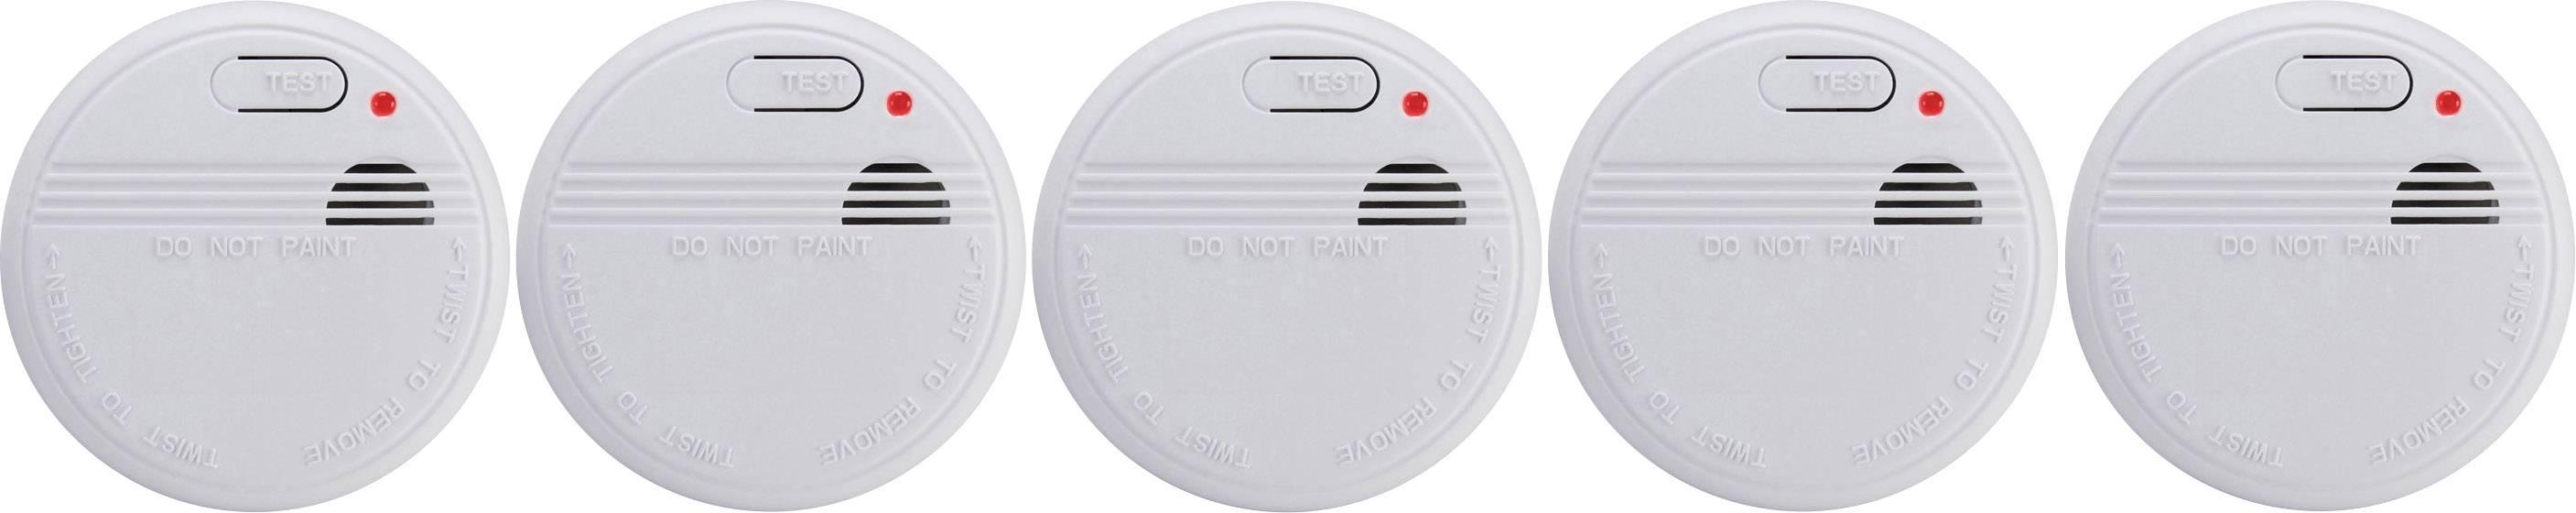 Detektor kouře Basetech na baterii, sada 5 ks